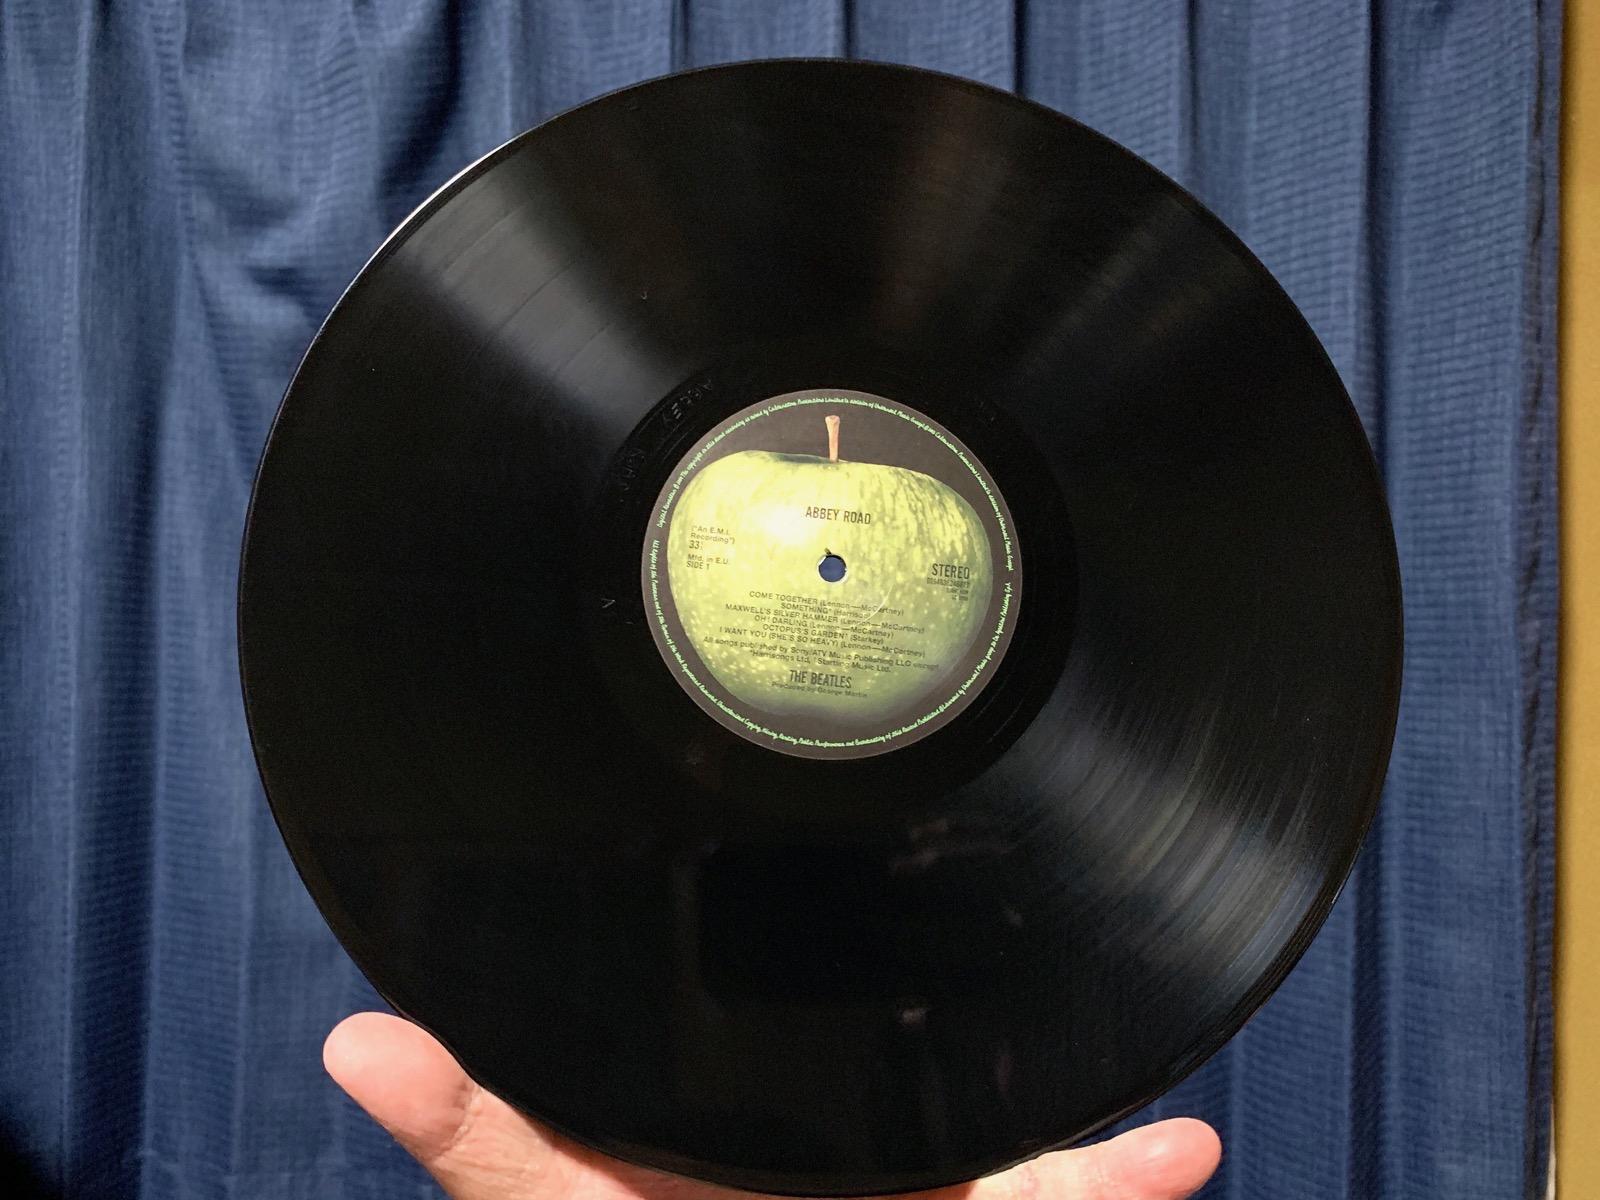 deagostini abbey road レコード